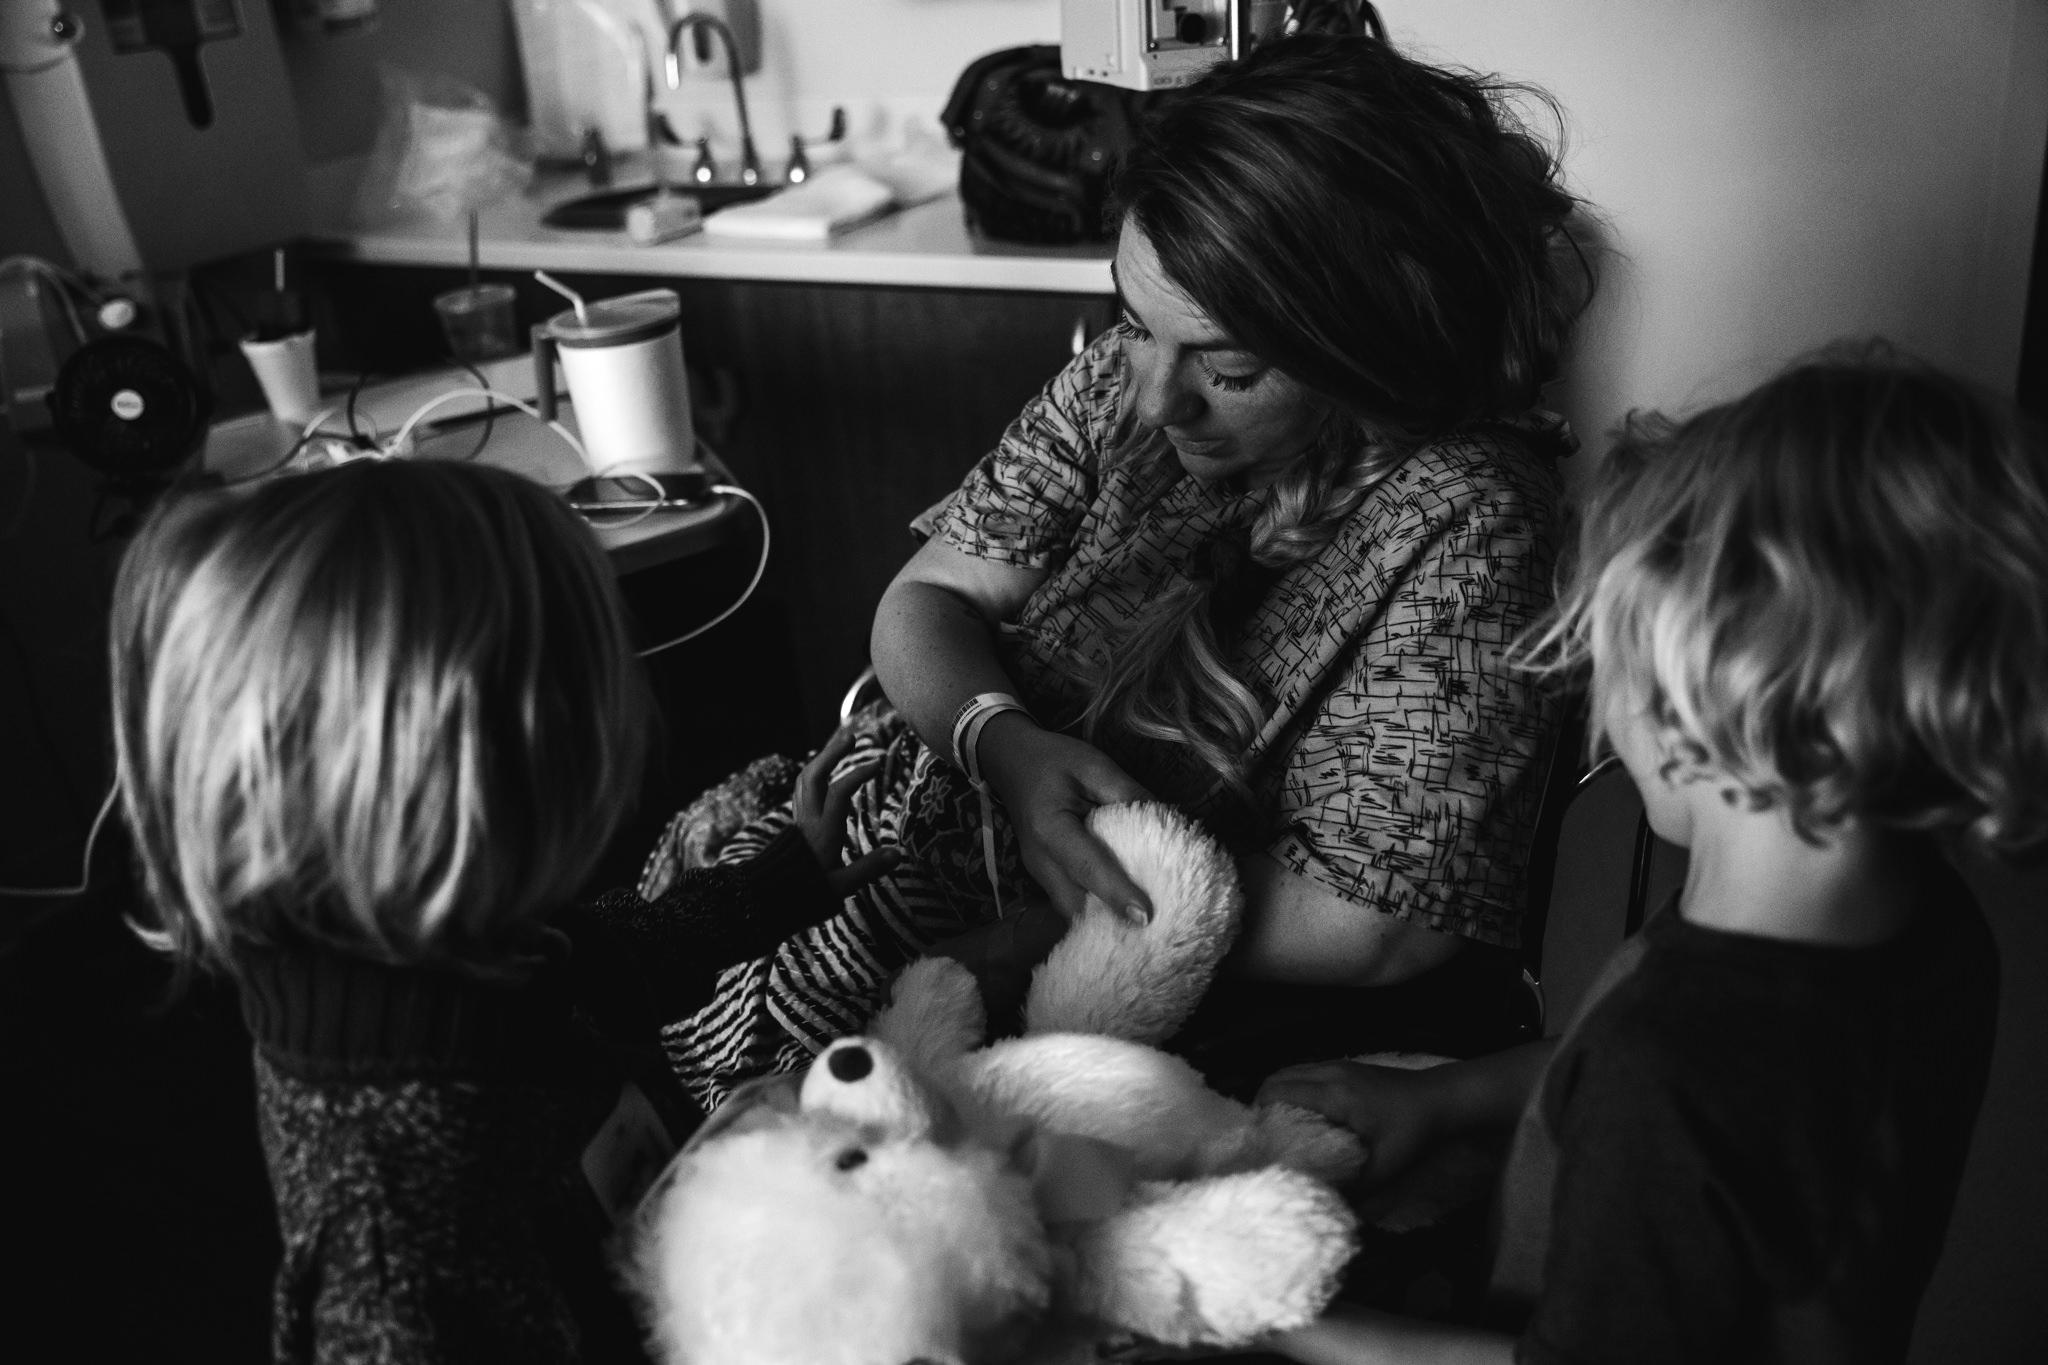 birth-photography-documentary-family-photographer-144.jpg